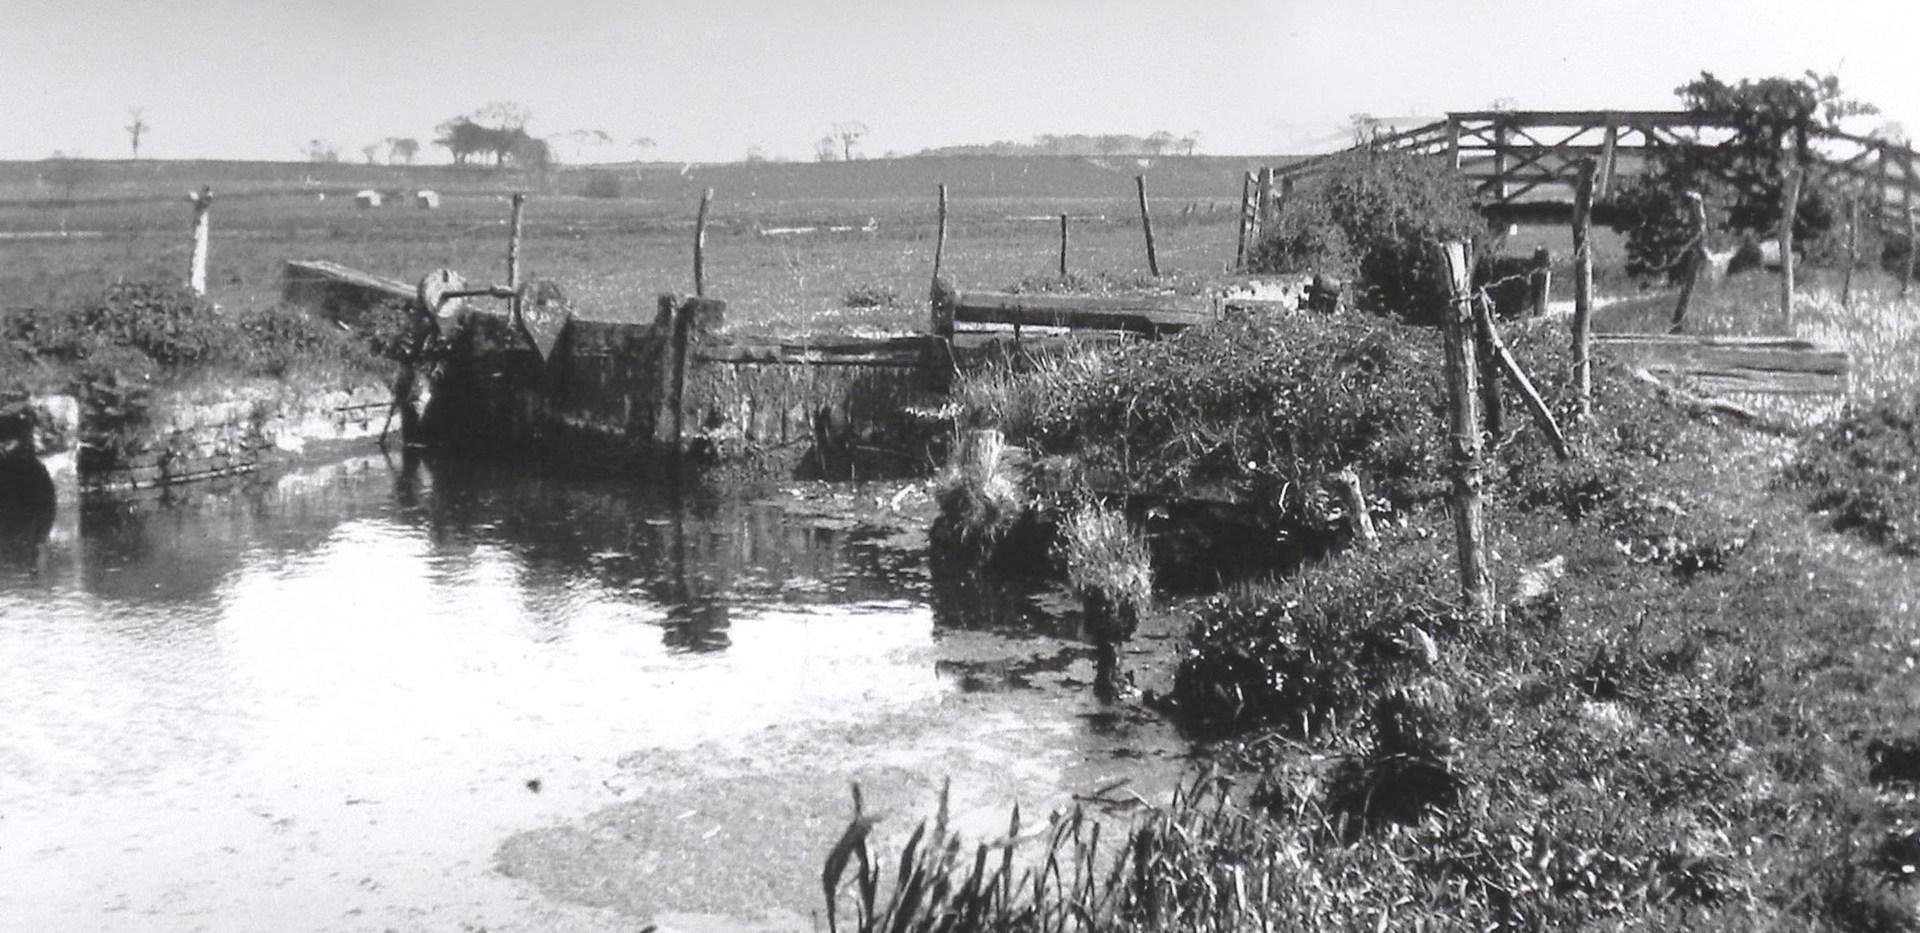 Burgh Lock after the 1912 flood